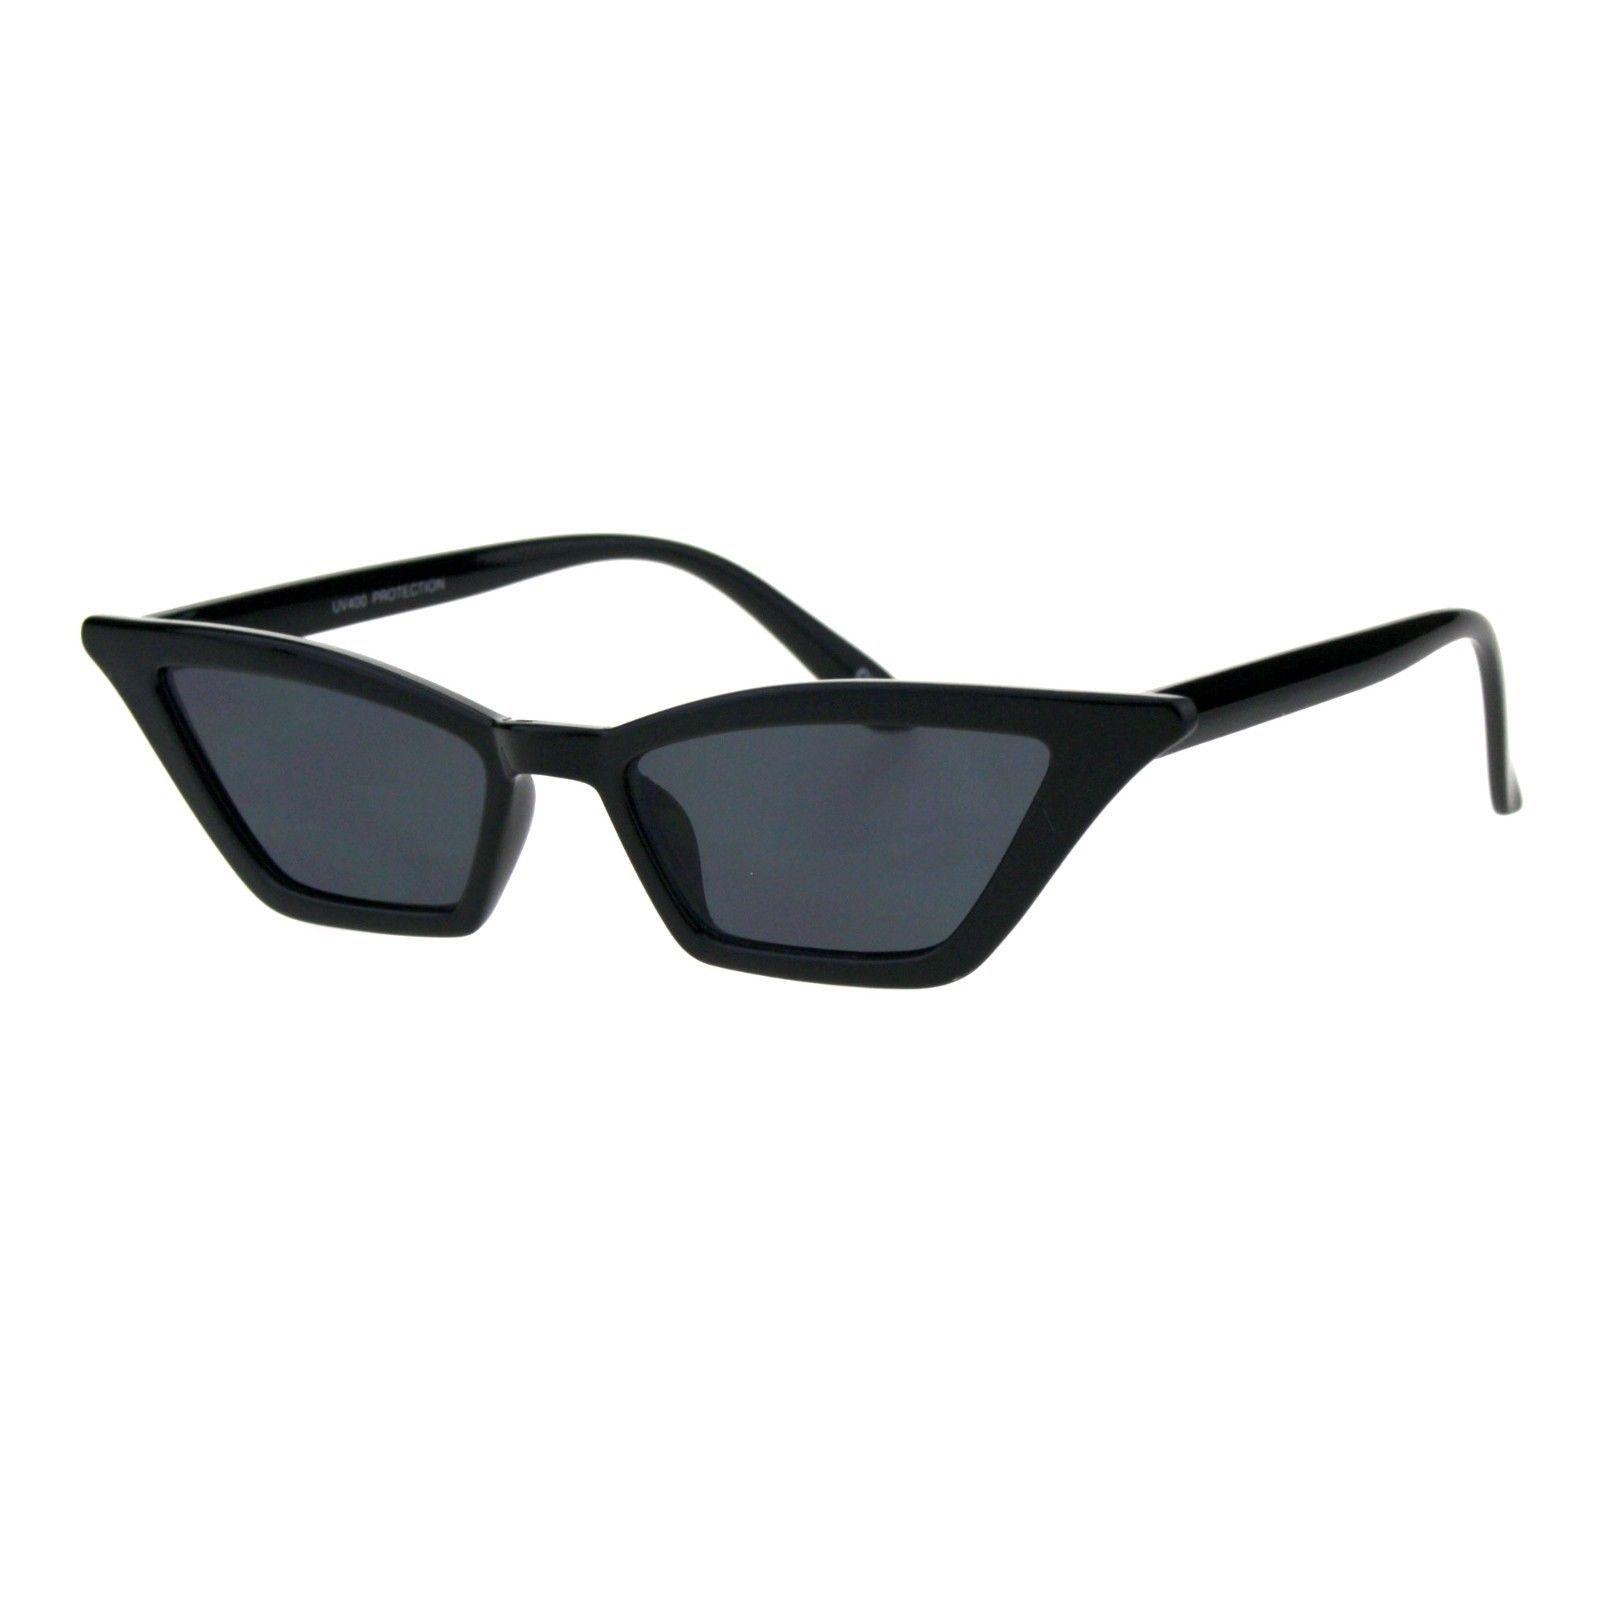 Womens Skinny Sunglasses Trapezoid Shape Glamorous Cateye Frame